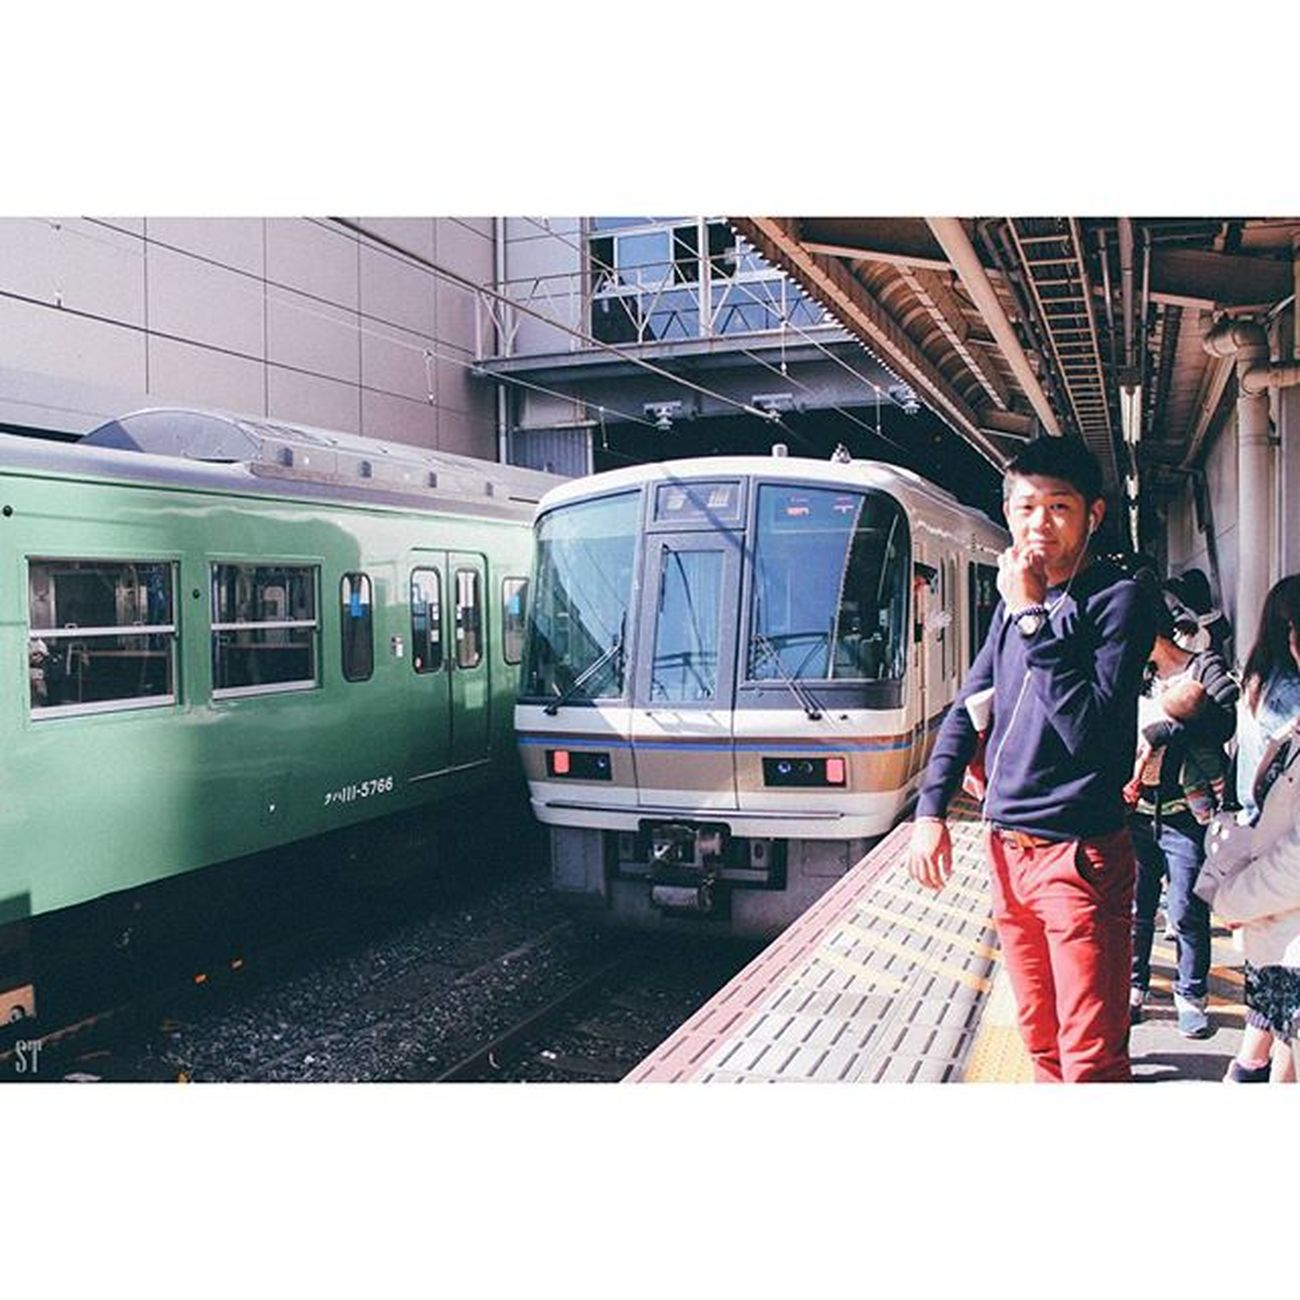 Trainstation Kyoto Kyotostation Trains locomotive people waitingfortrain trainphotography